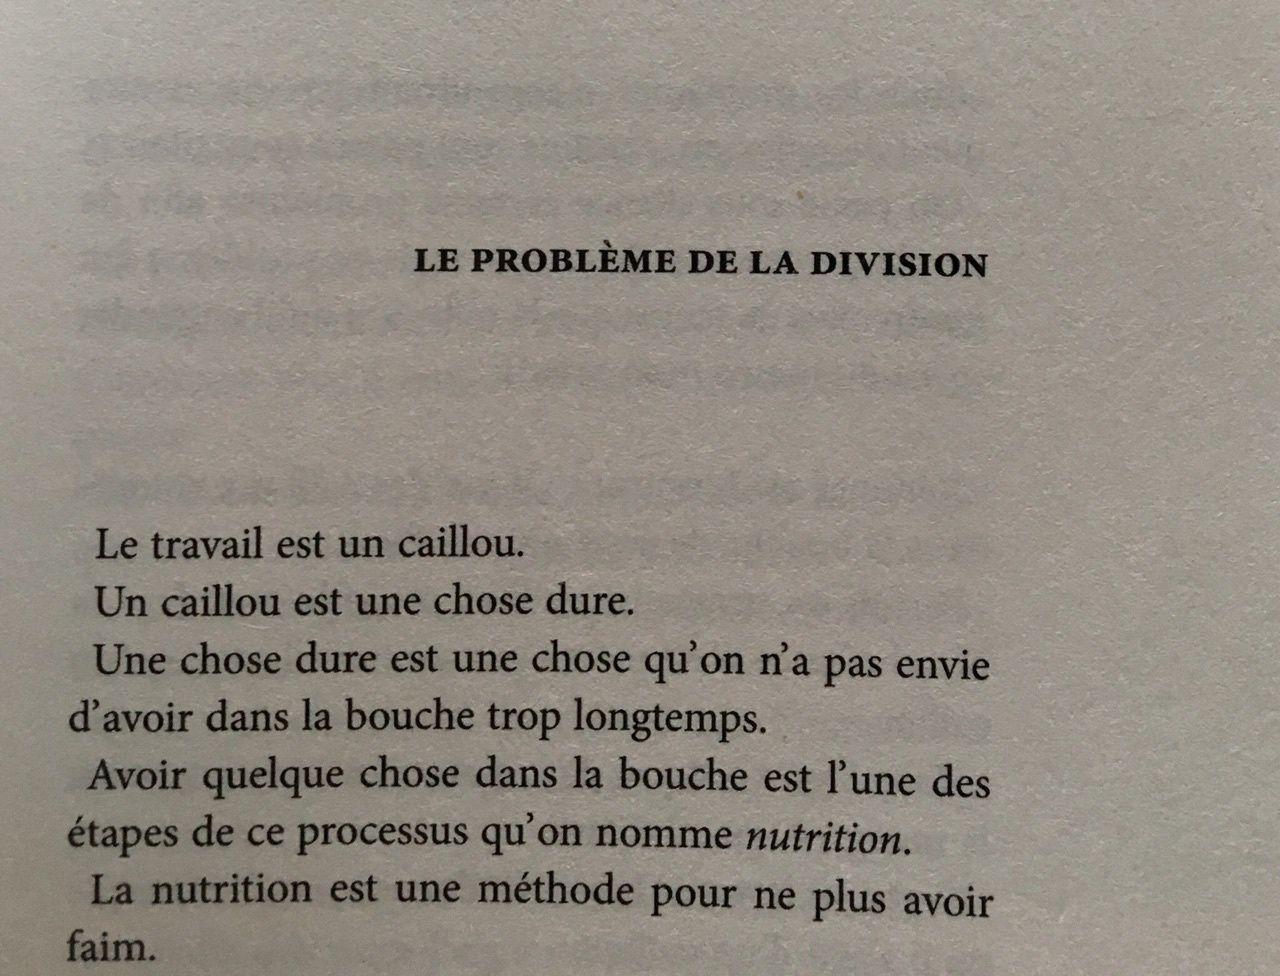 Substitution - Antoine Mouton